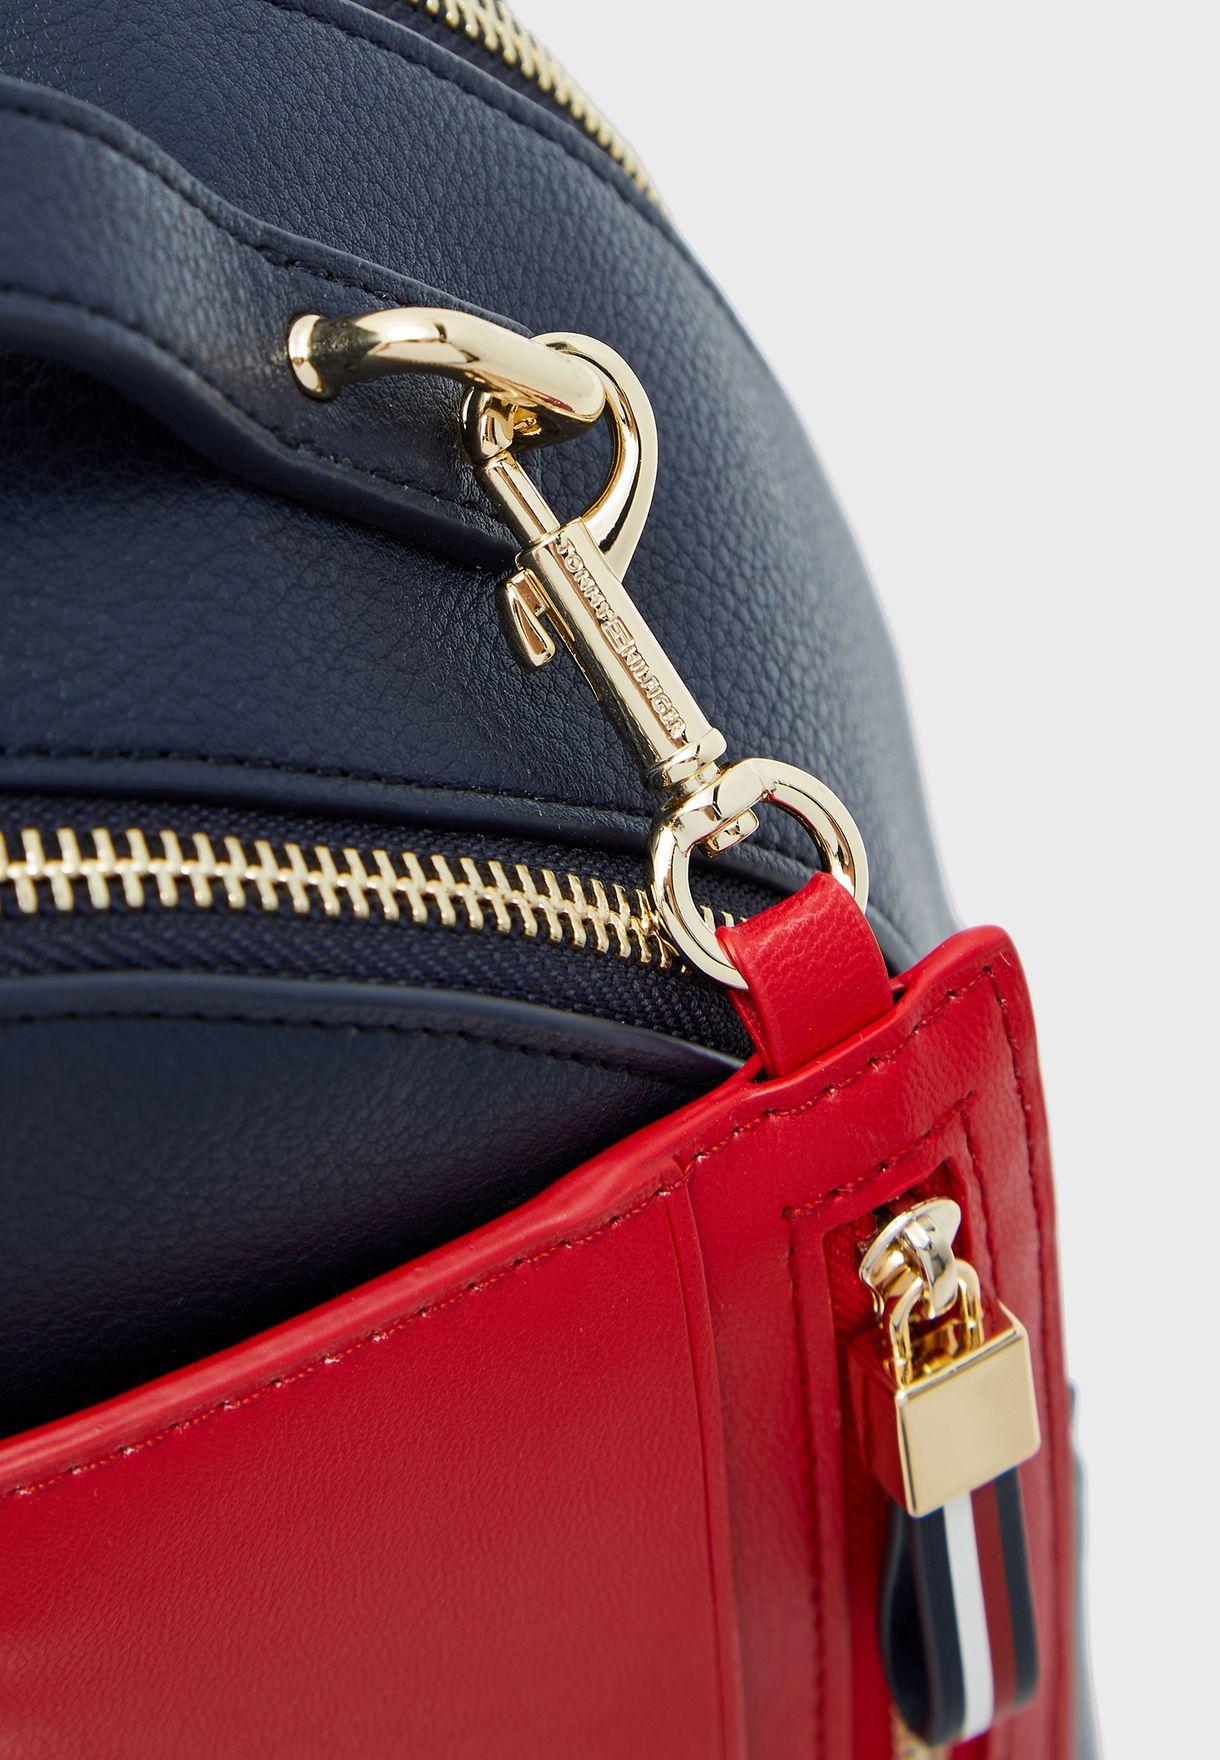 Charming Top Zip Backpack